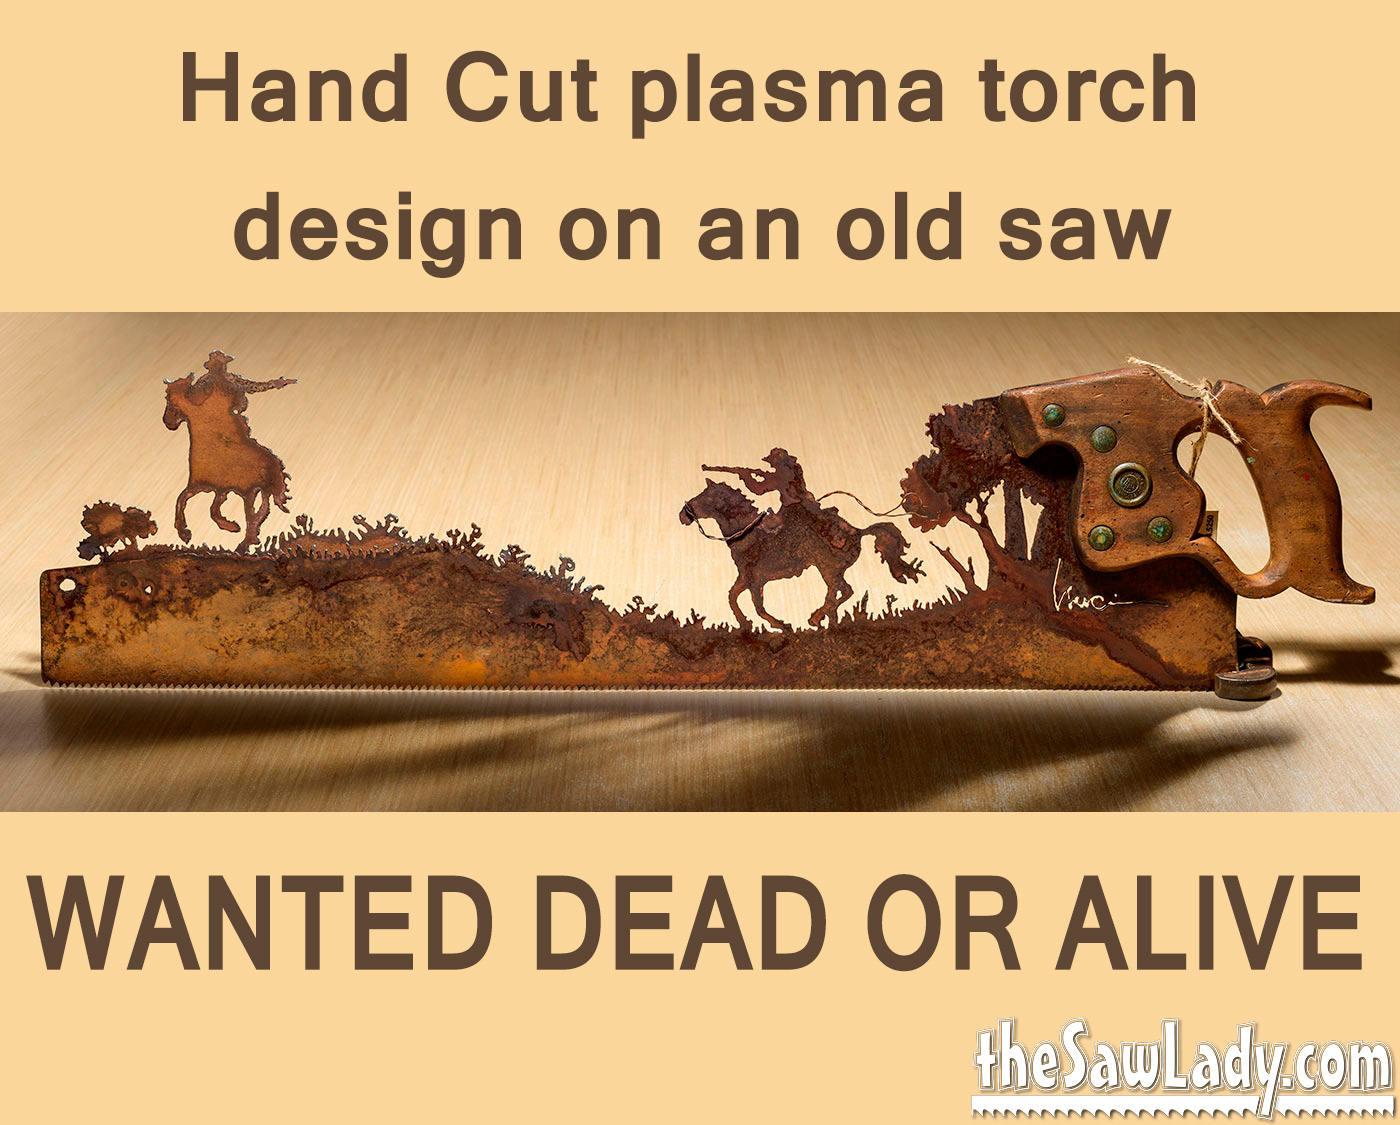 Gunfight on Horses design Hand plasma cut hand saw Metal Art | Etsy